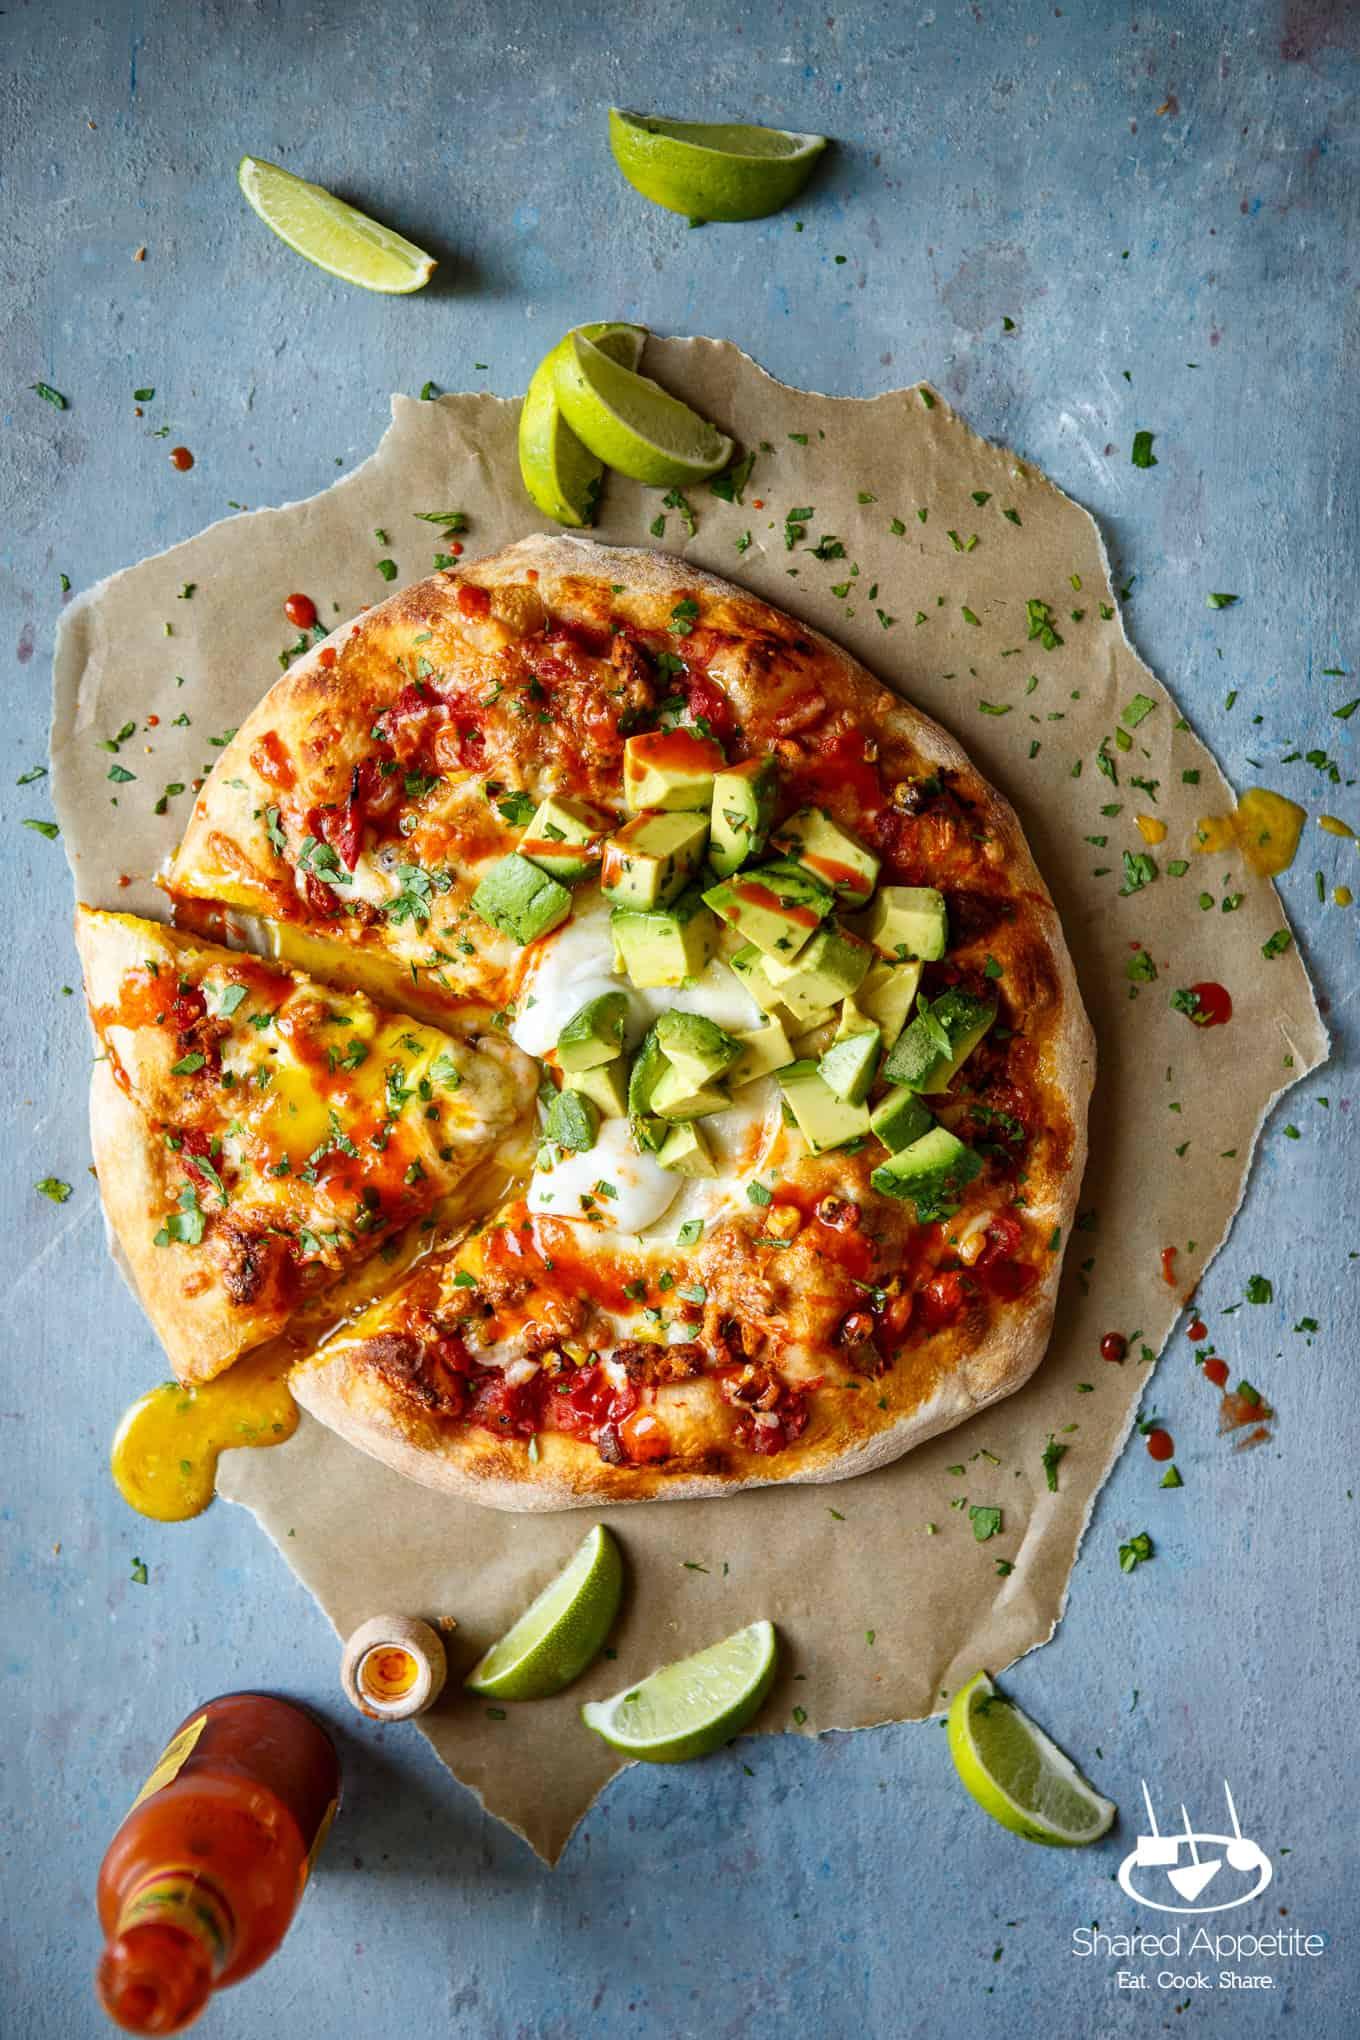 Dripping Egg Yolk from the Huevos Rancheros Pizza with Turkey Chorizo | sharedappetite.com